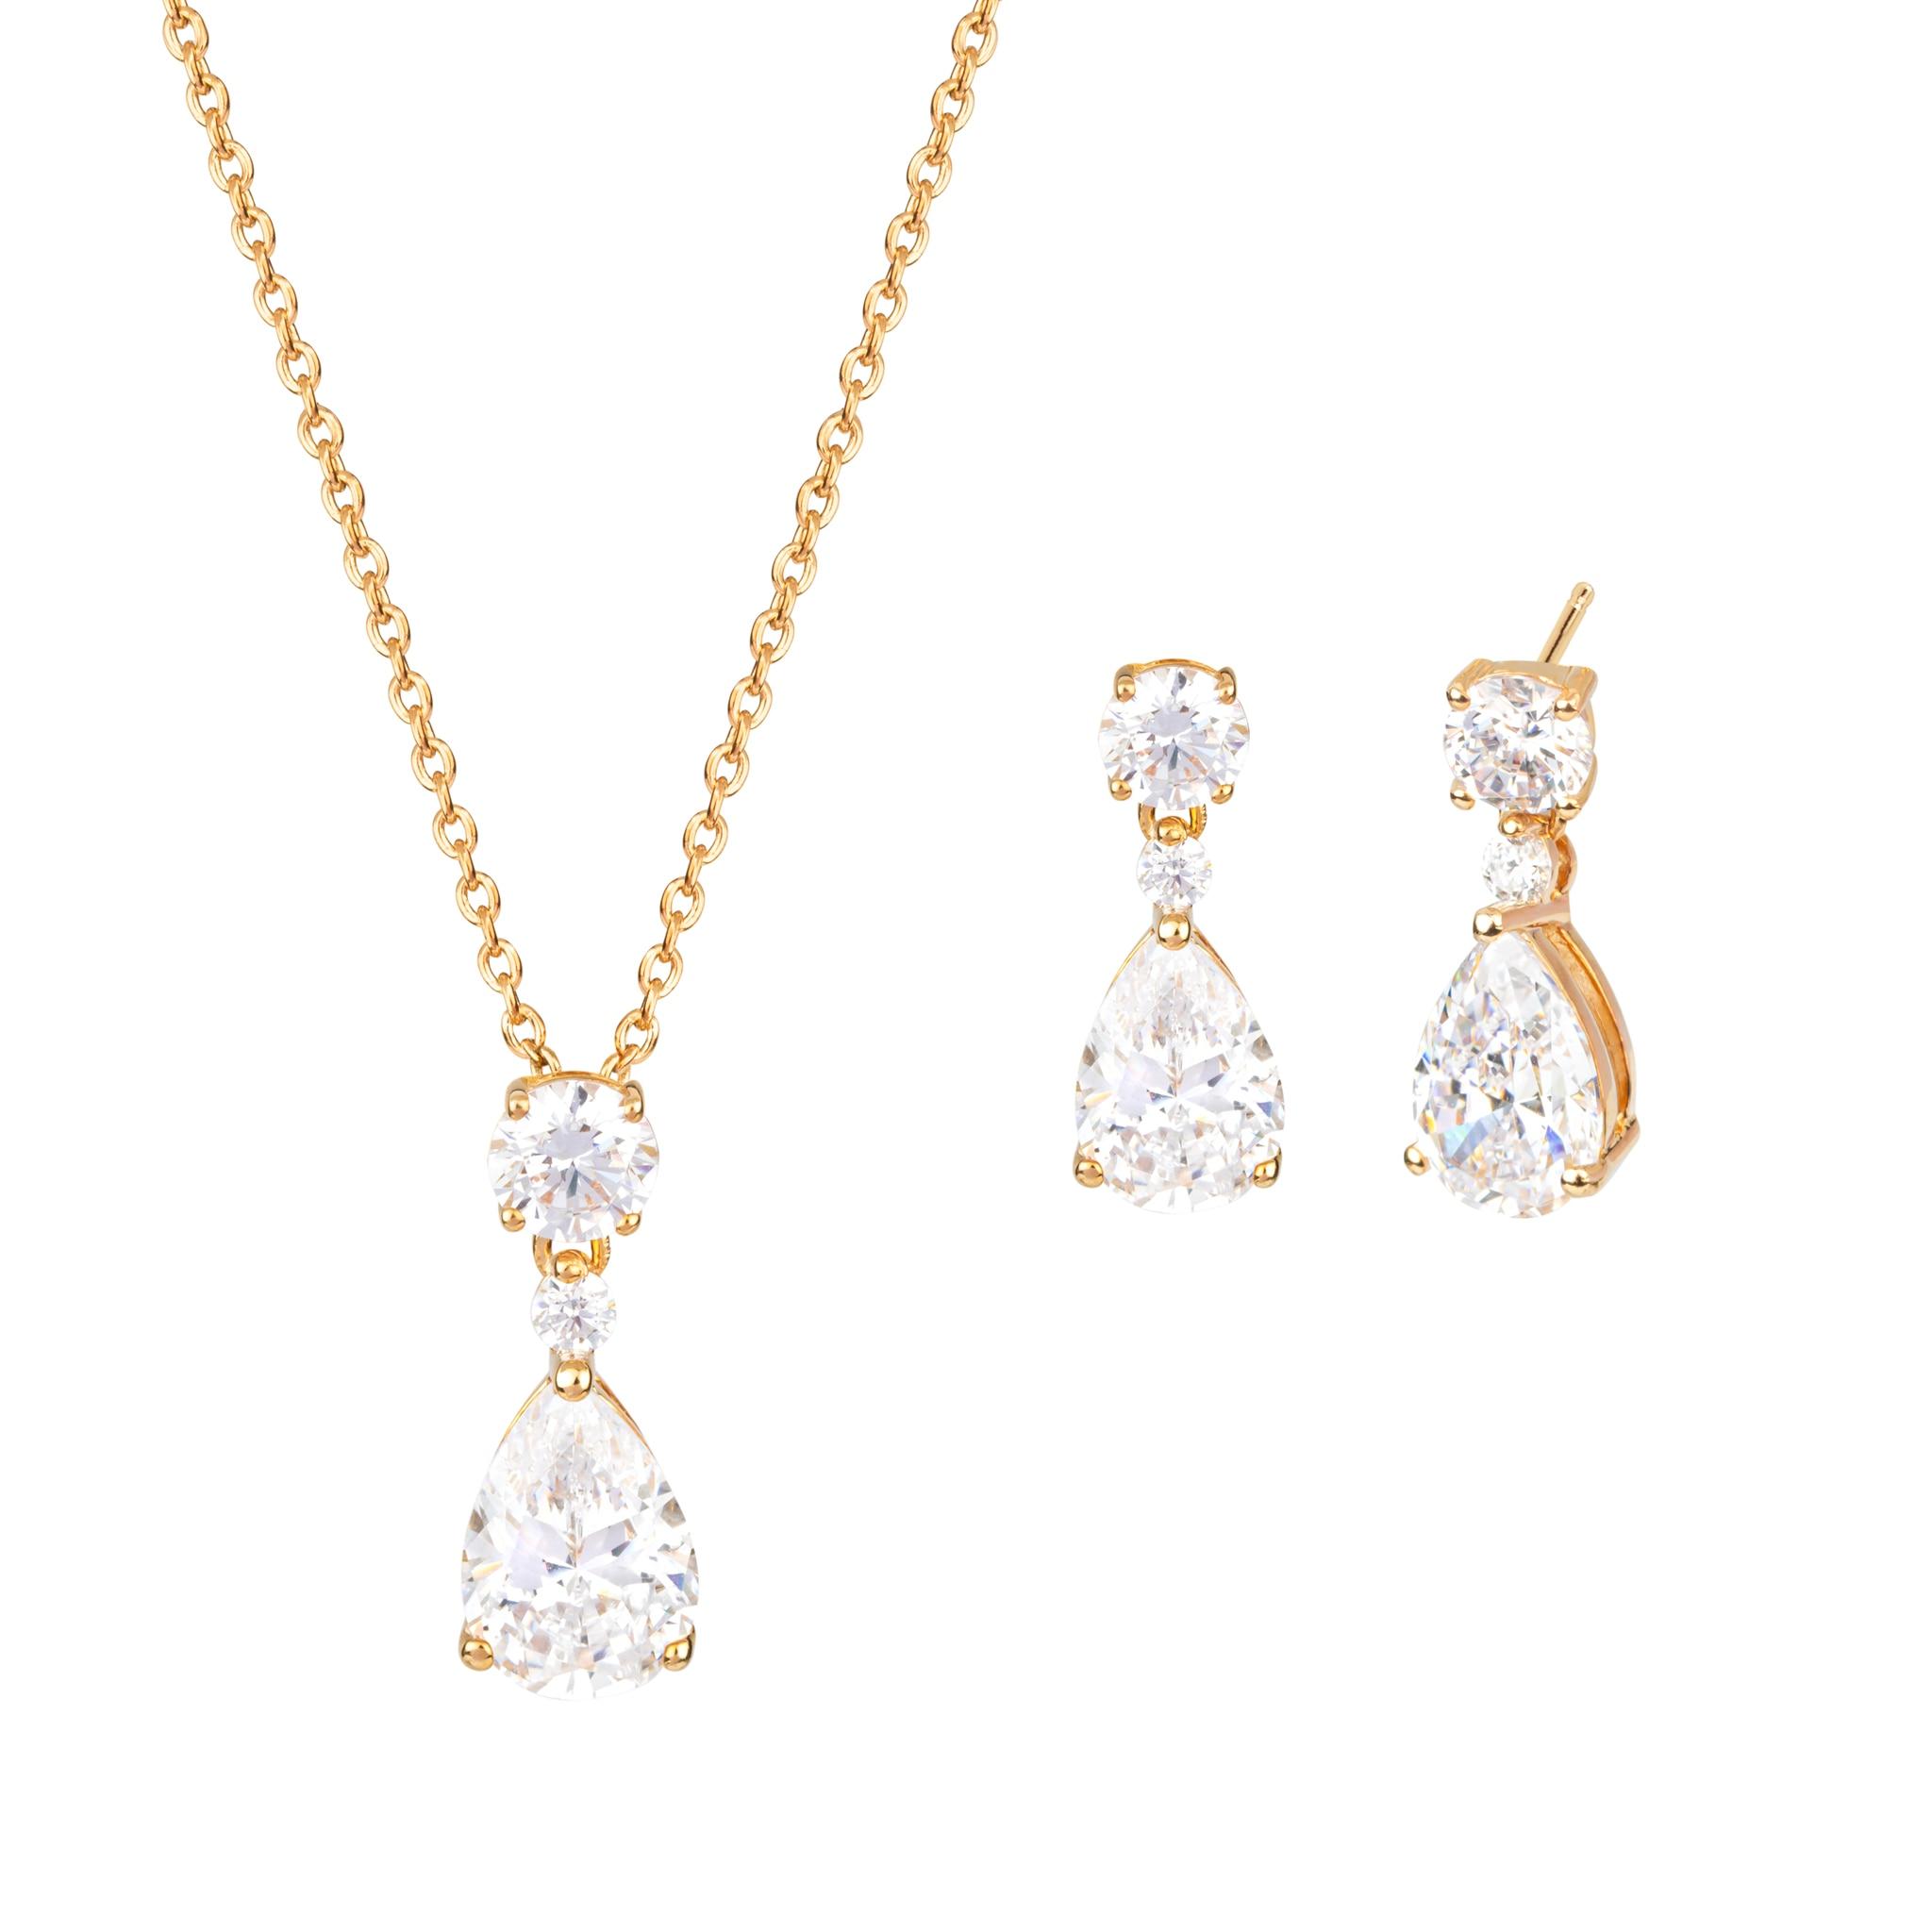 Tear pendant and earrings